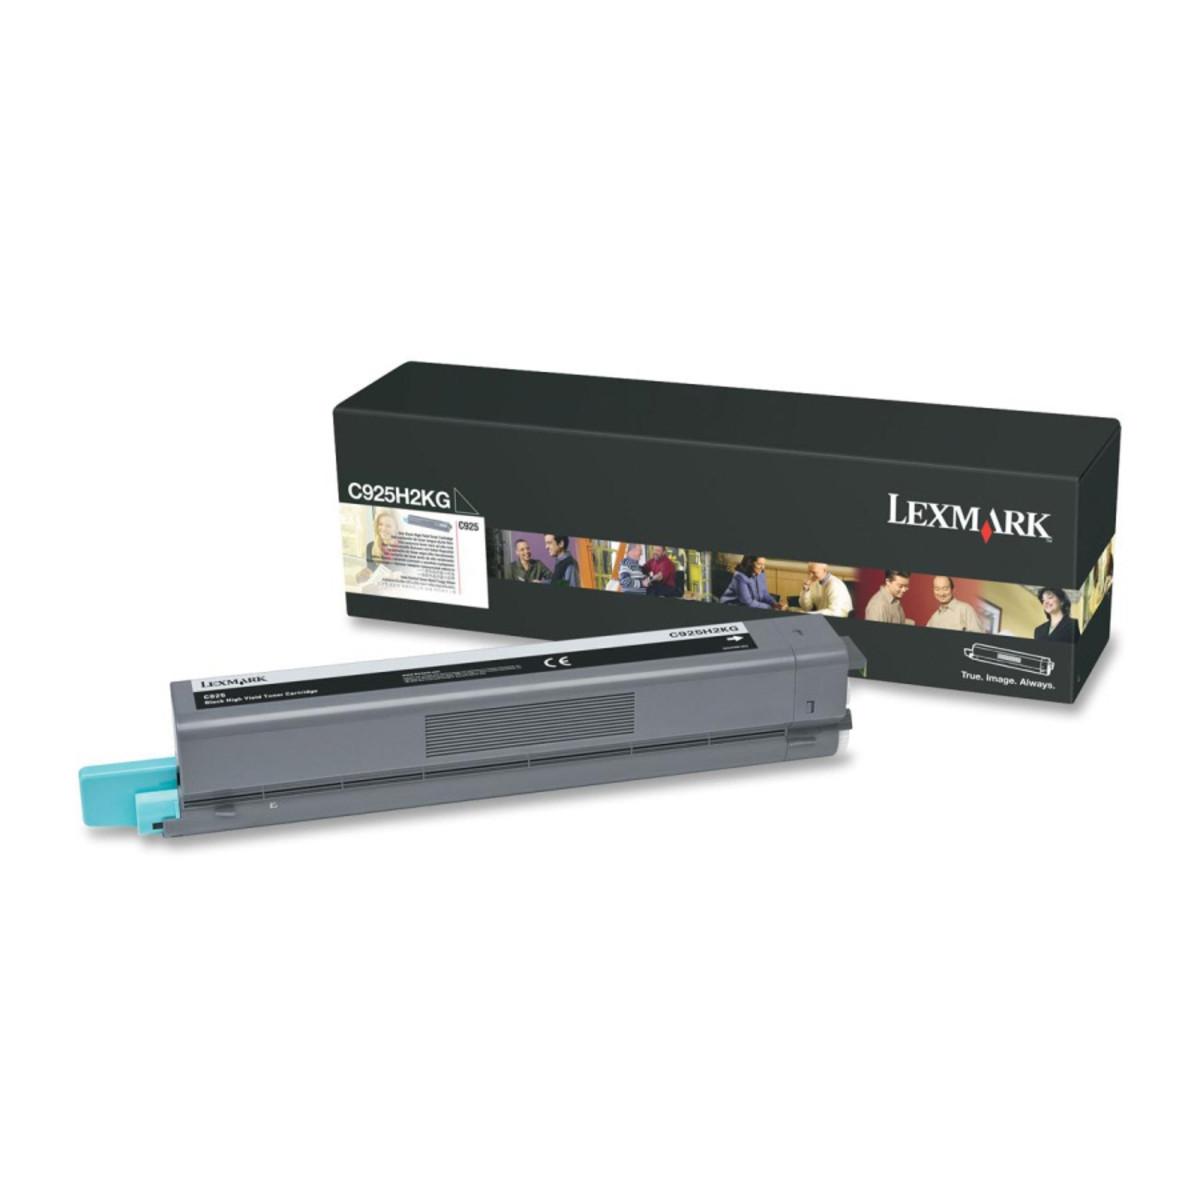 Lexmark C925H2KG Black Toner Cartridge - High Yield